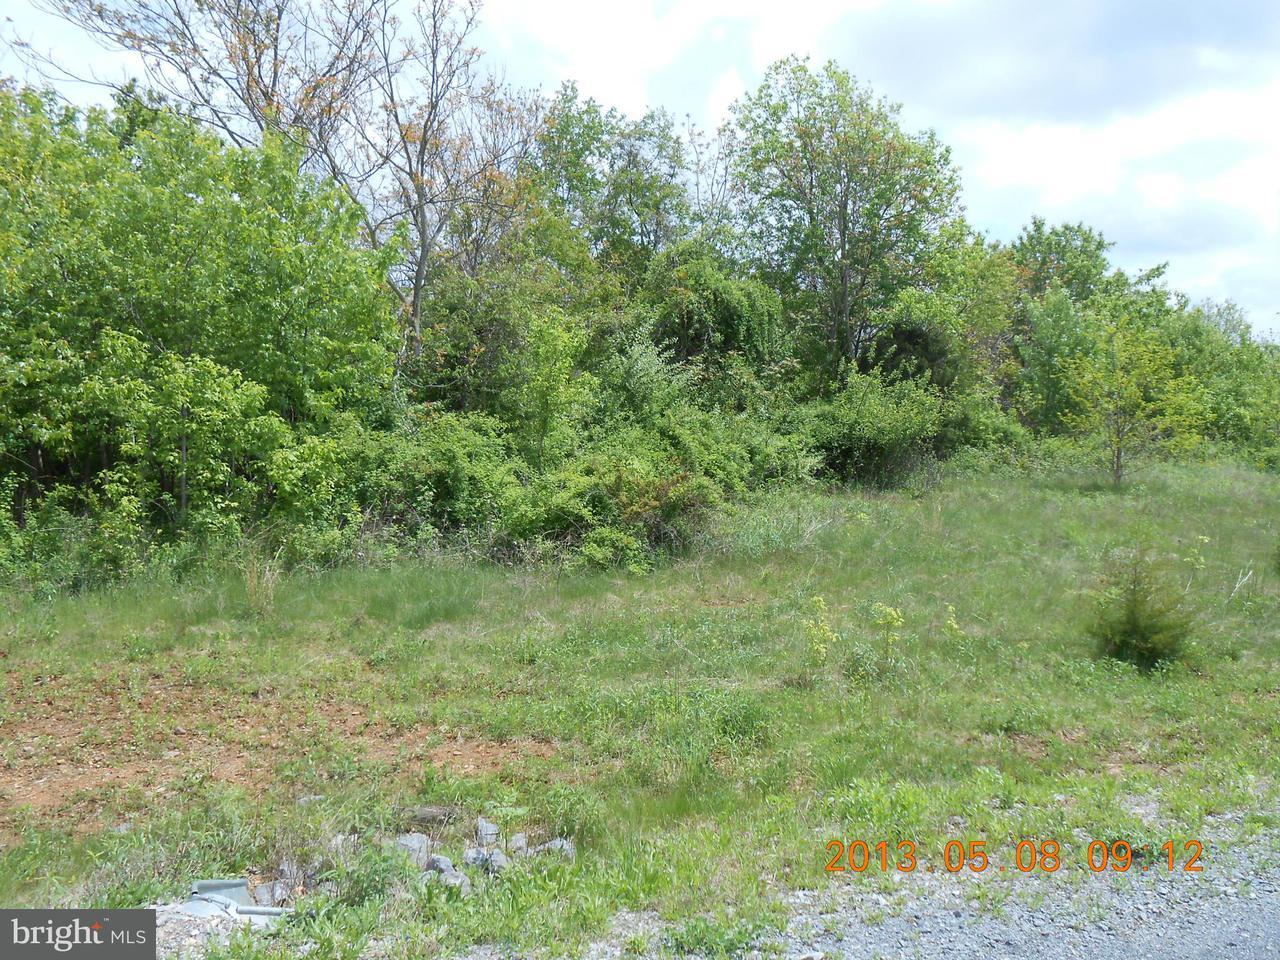 Land for Sale at 29lot # Apple Jack Ct Mercersburg, Pennsylvania 17236 United States